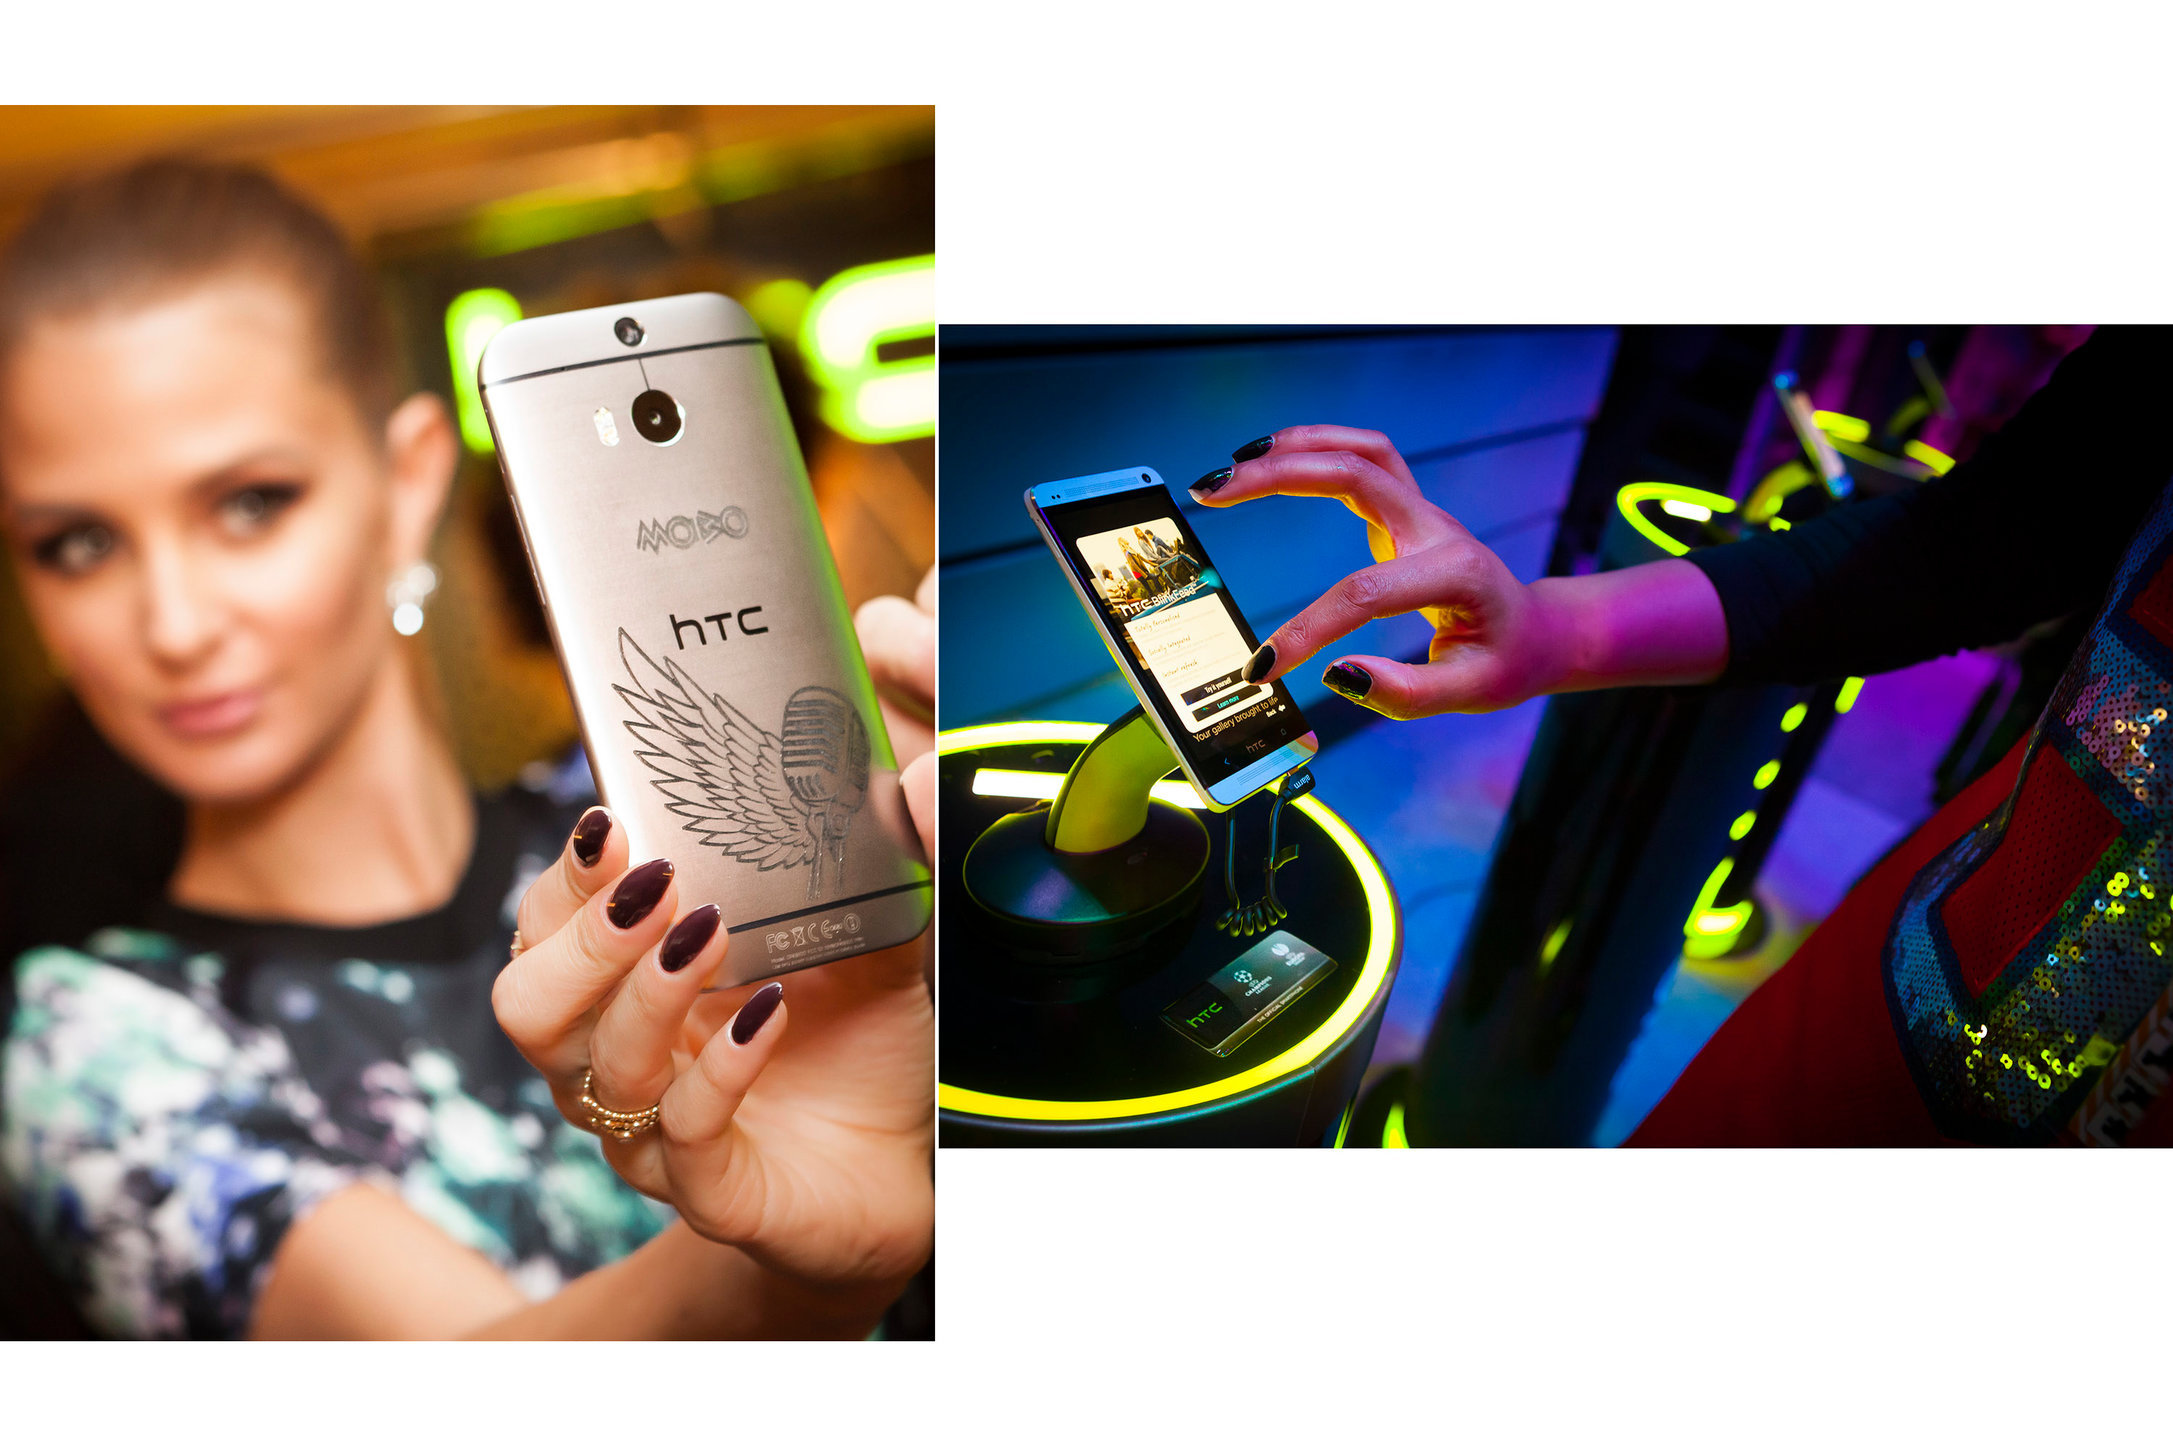 HTC@MOBOS2014-2638-HighRes.jpg